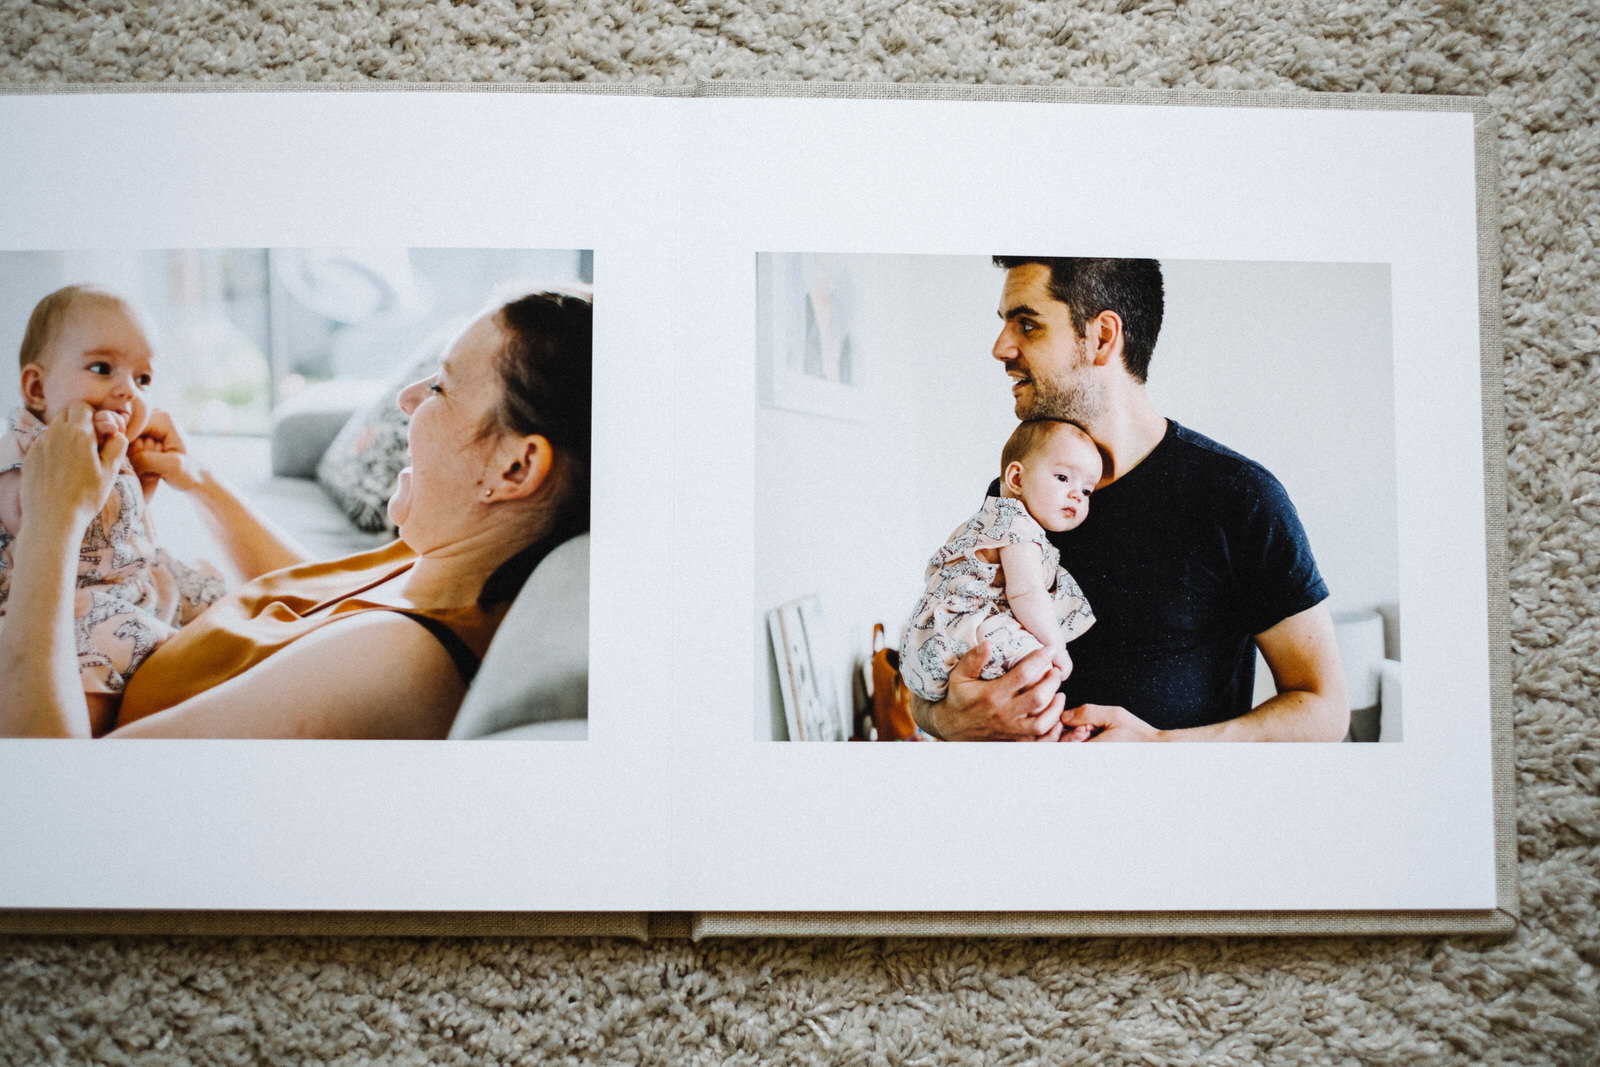 family-story-photos-photo-album-13.jpg